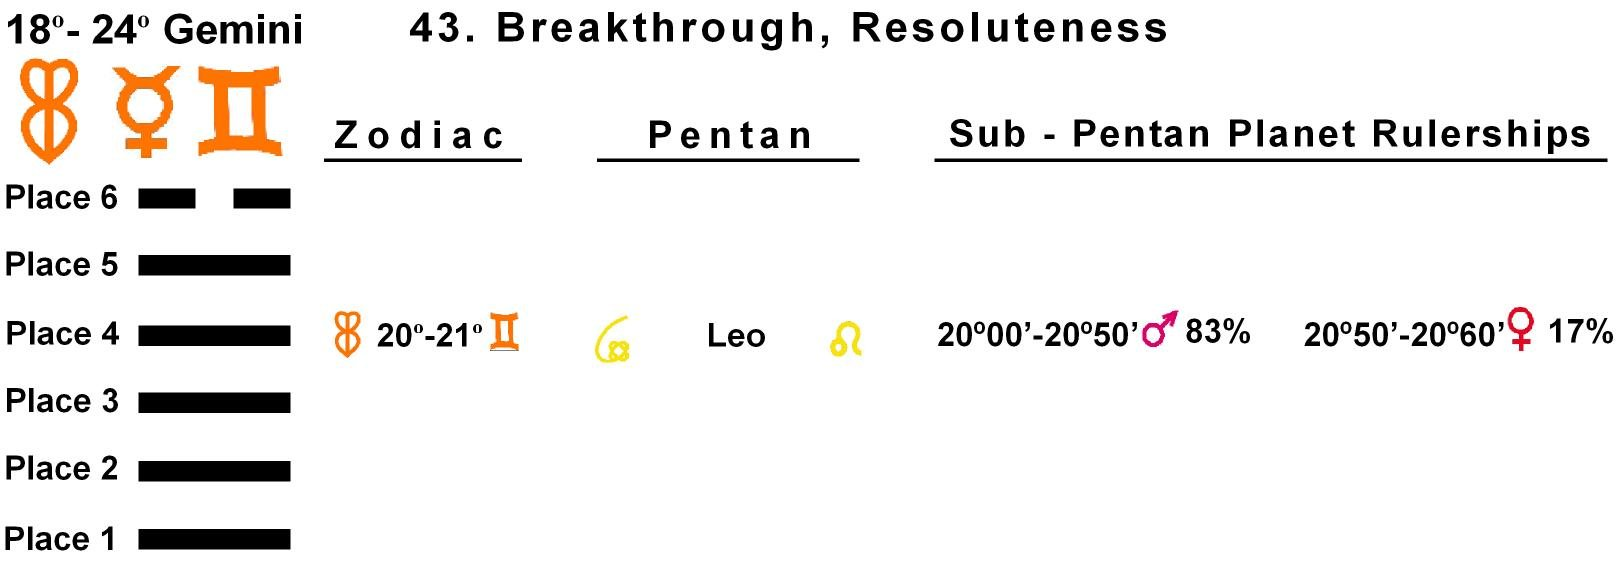 Pent-lines-03GE 20-21 Hx-43 Breakthrough